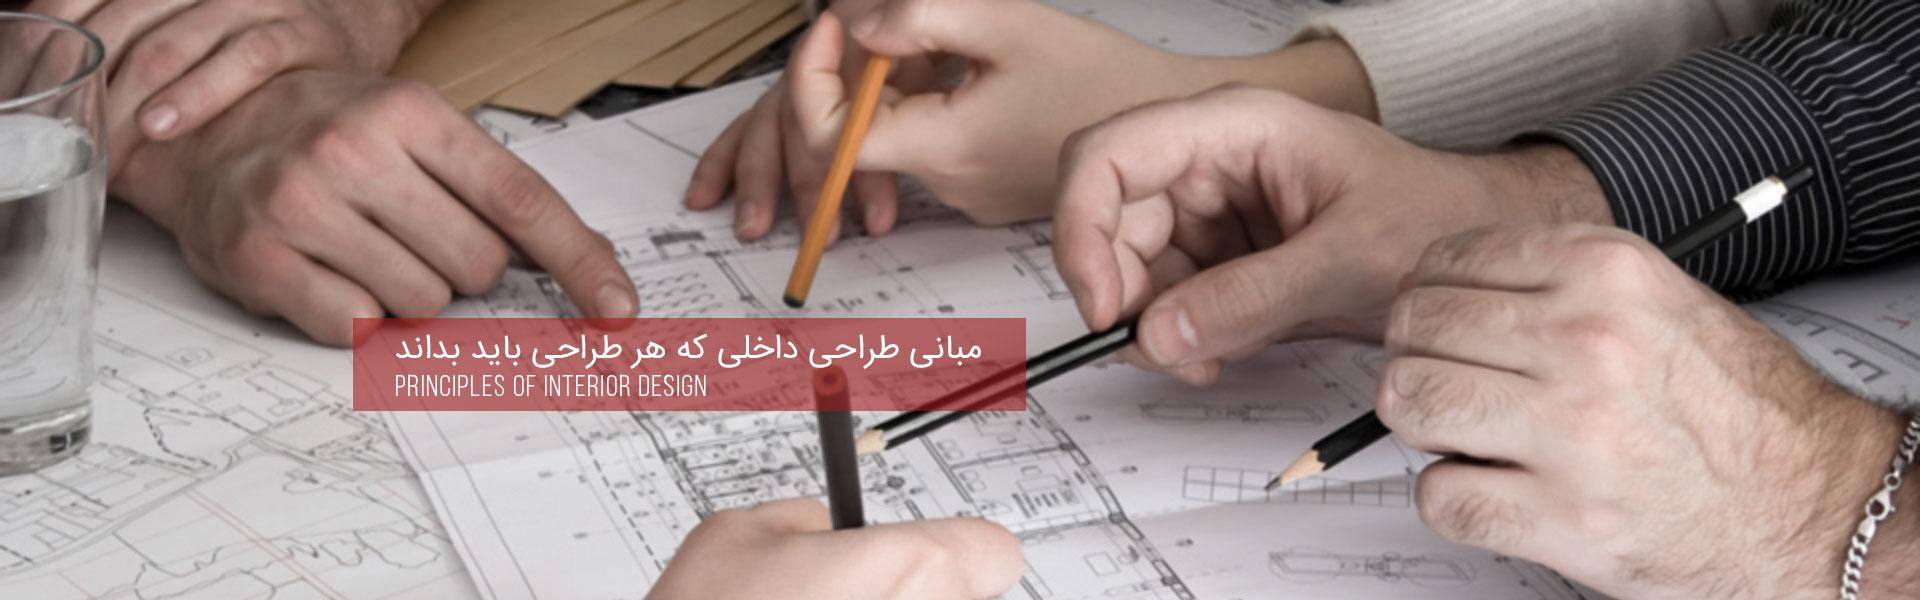 mabani tarahidakheli1 - مبانی طراحی داخلی که هر طراحی باید بداند